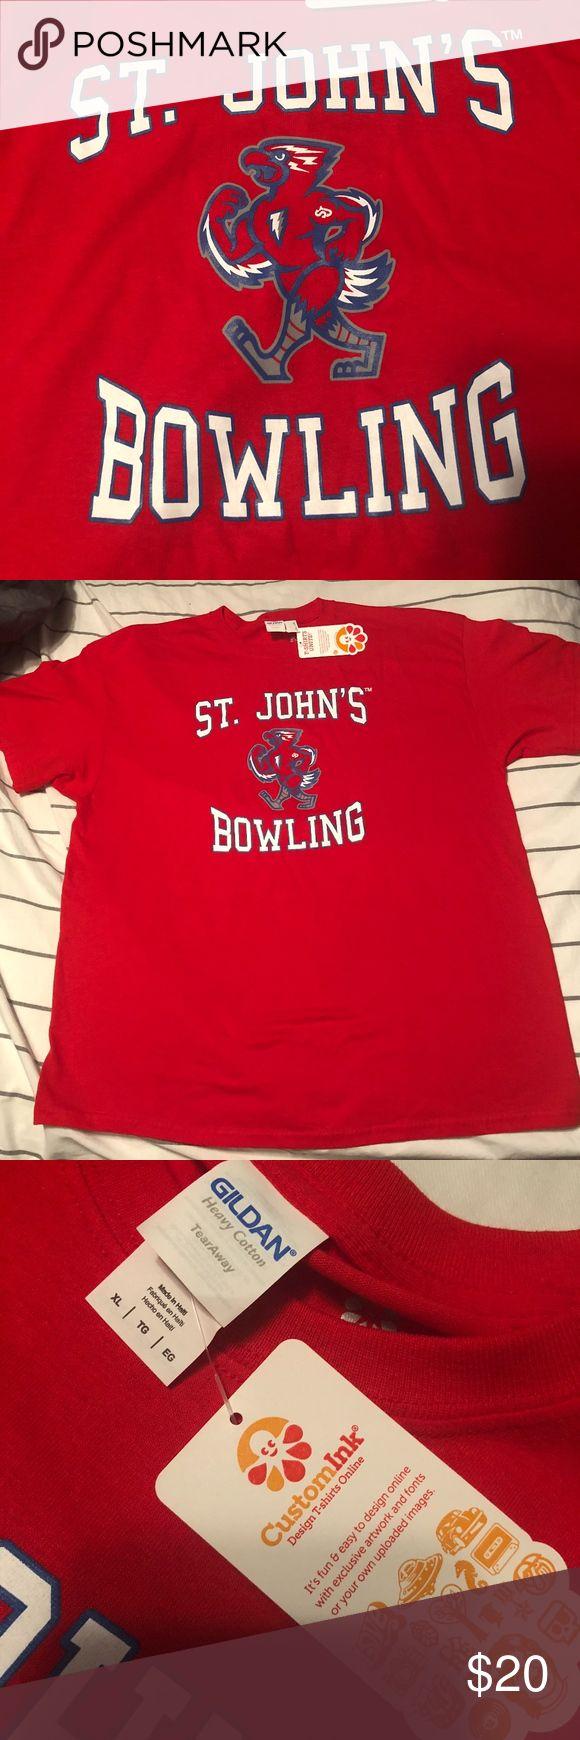 St. John's Univeristy Bowling Shirt Men's St. Johns University Bowling Shirt! Limited Edition. Gildan Shirts Tees - Short Sleeve #bowlingshirts